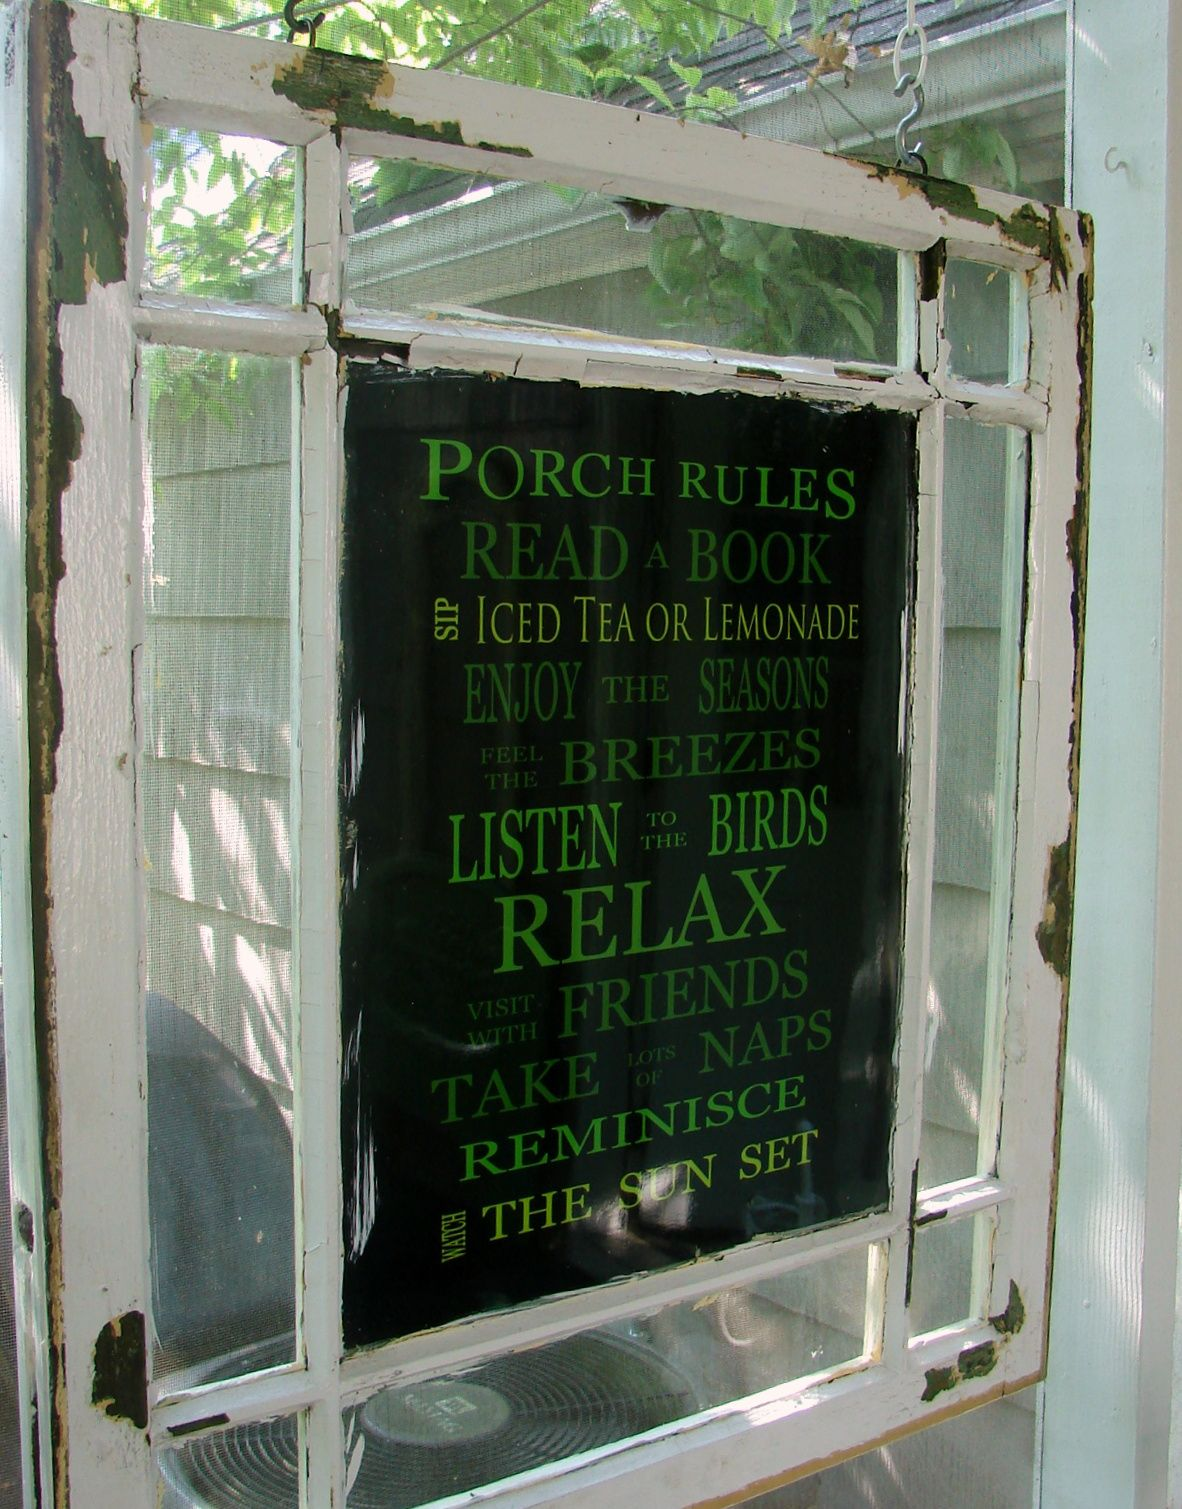 6 pane window frame ideas  custom comforts porch rules  repurpose  pinterest  porch and gardens